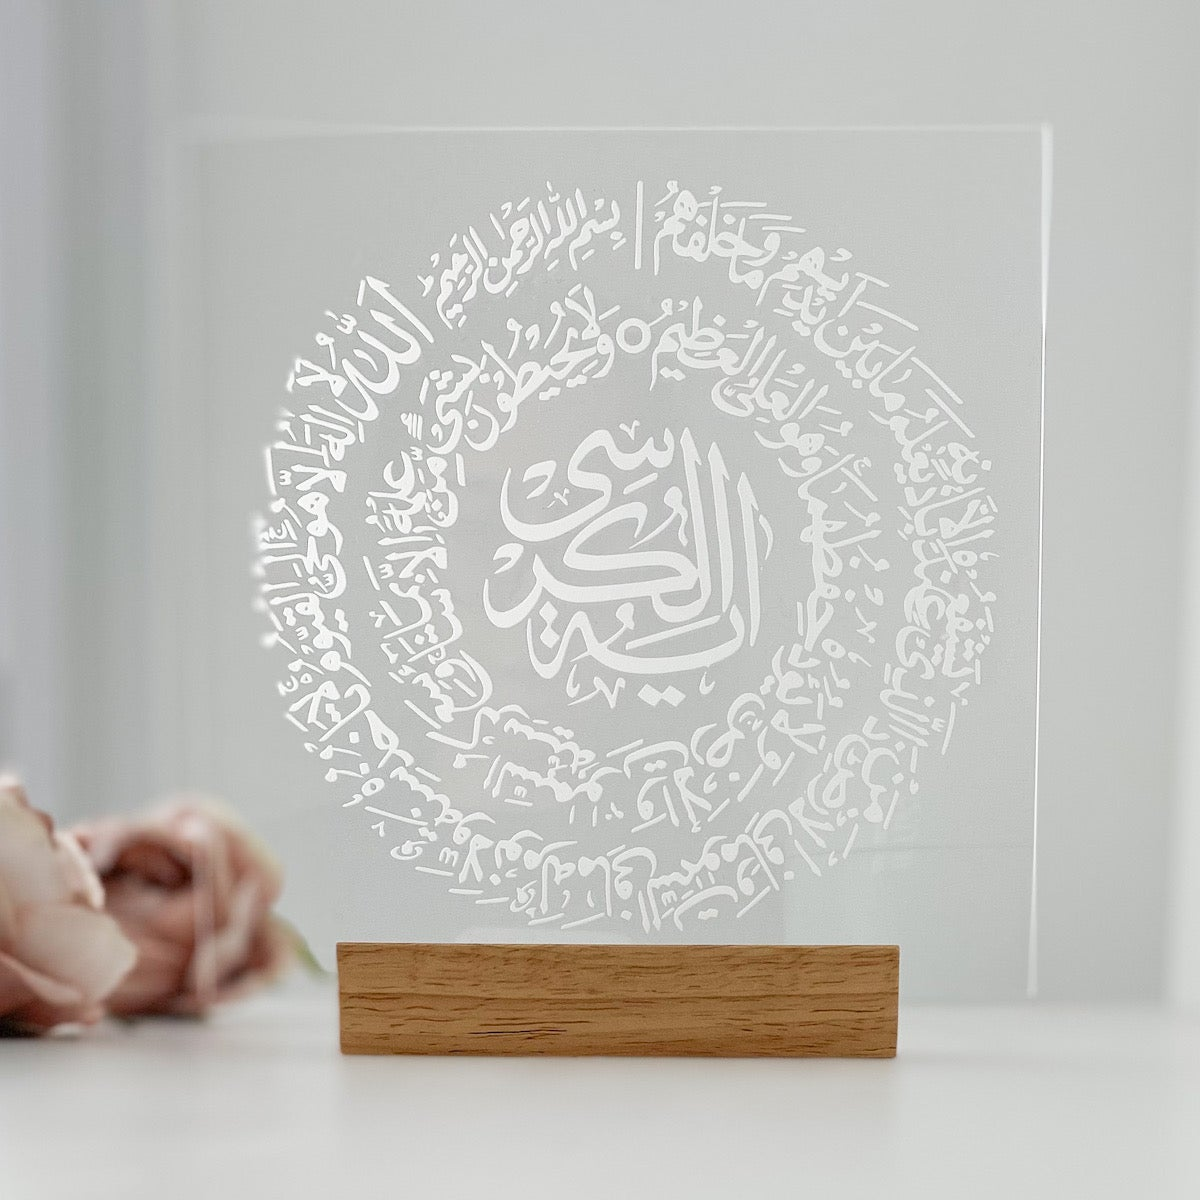 Image of clear ayatul kursi